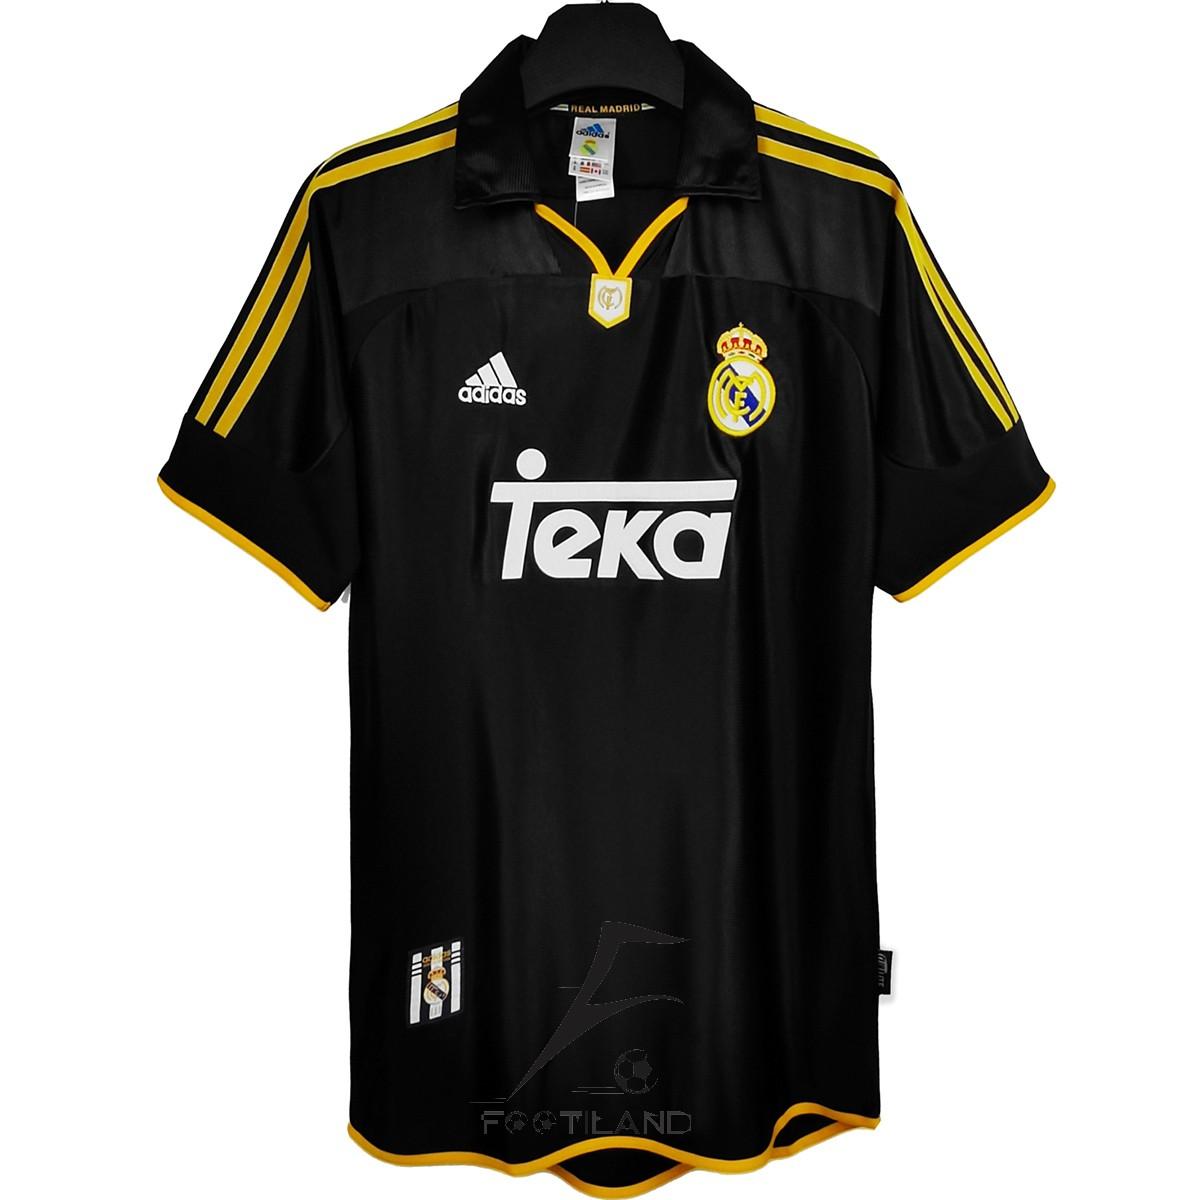 لباس کلاسیک رئال مادرید دوم 2000